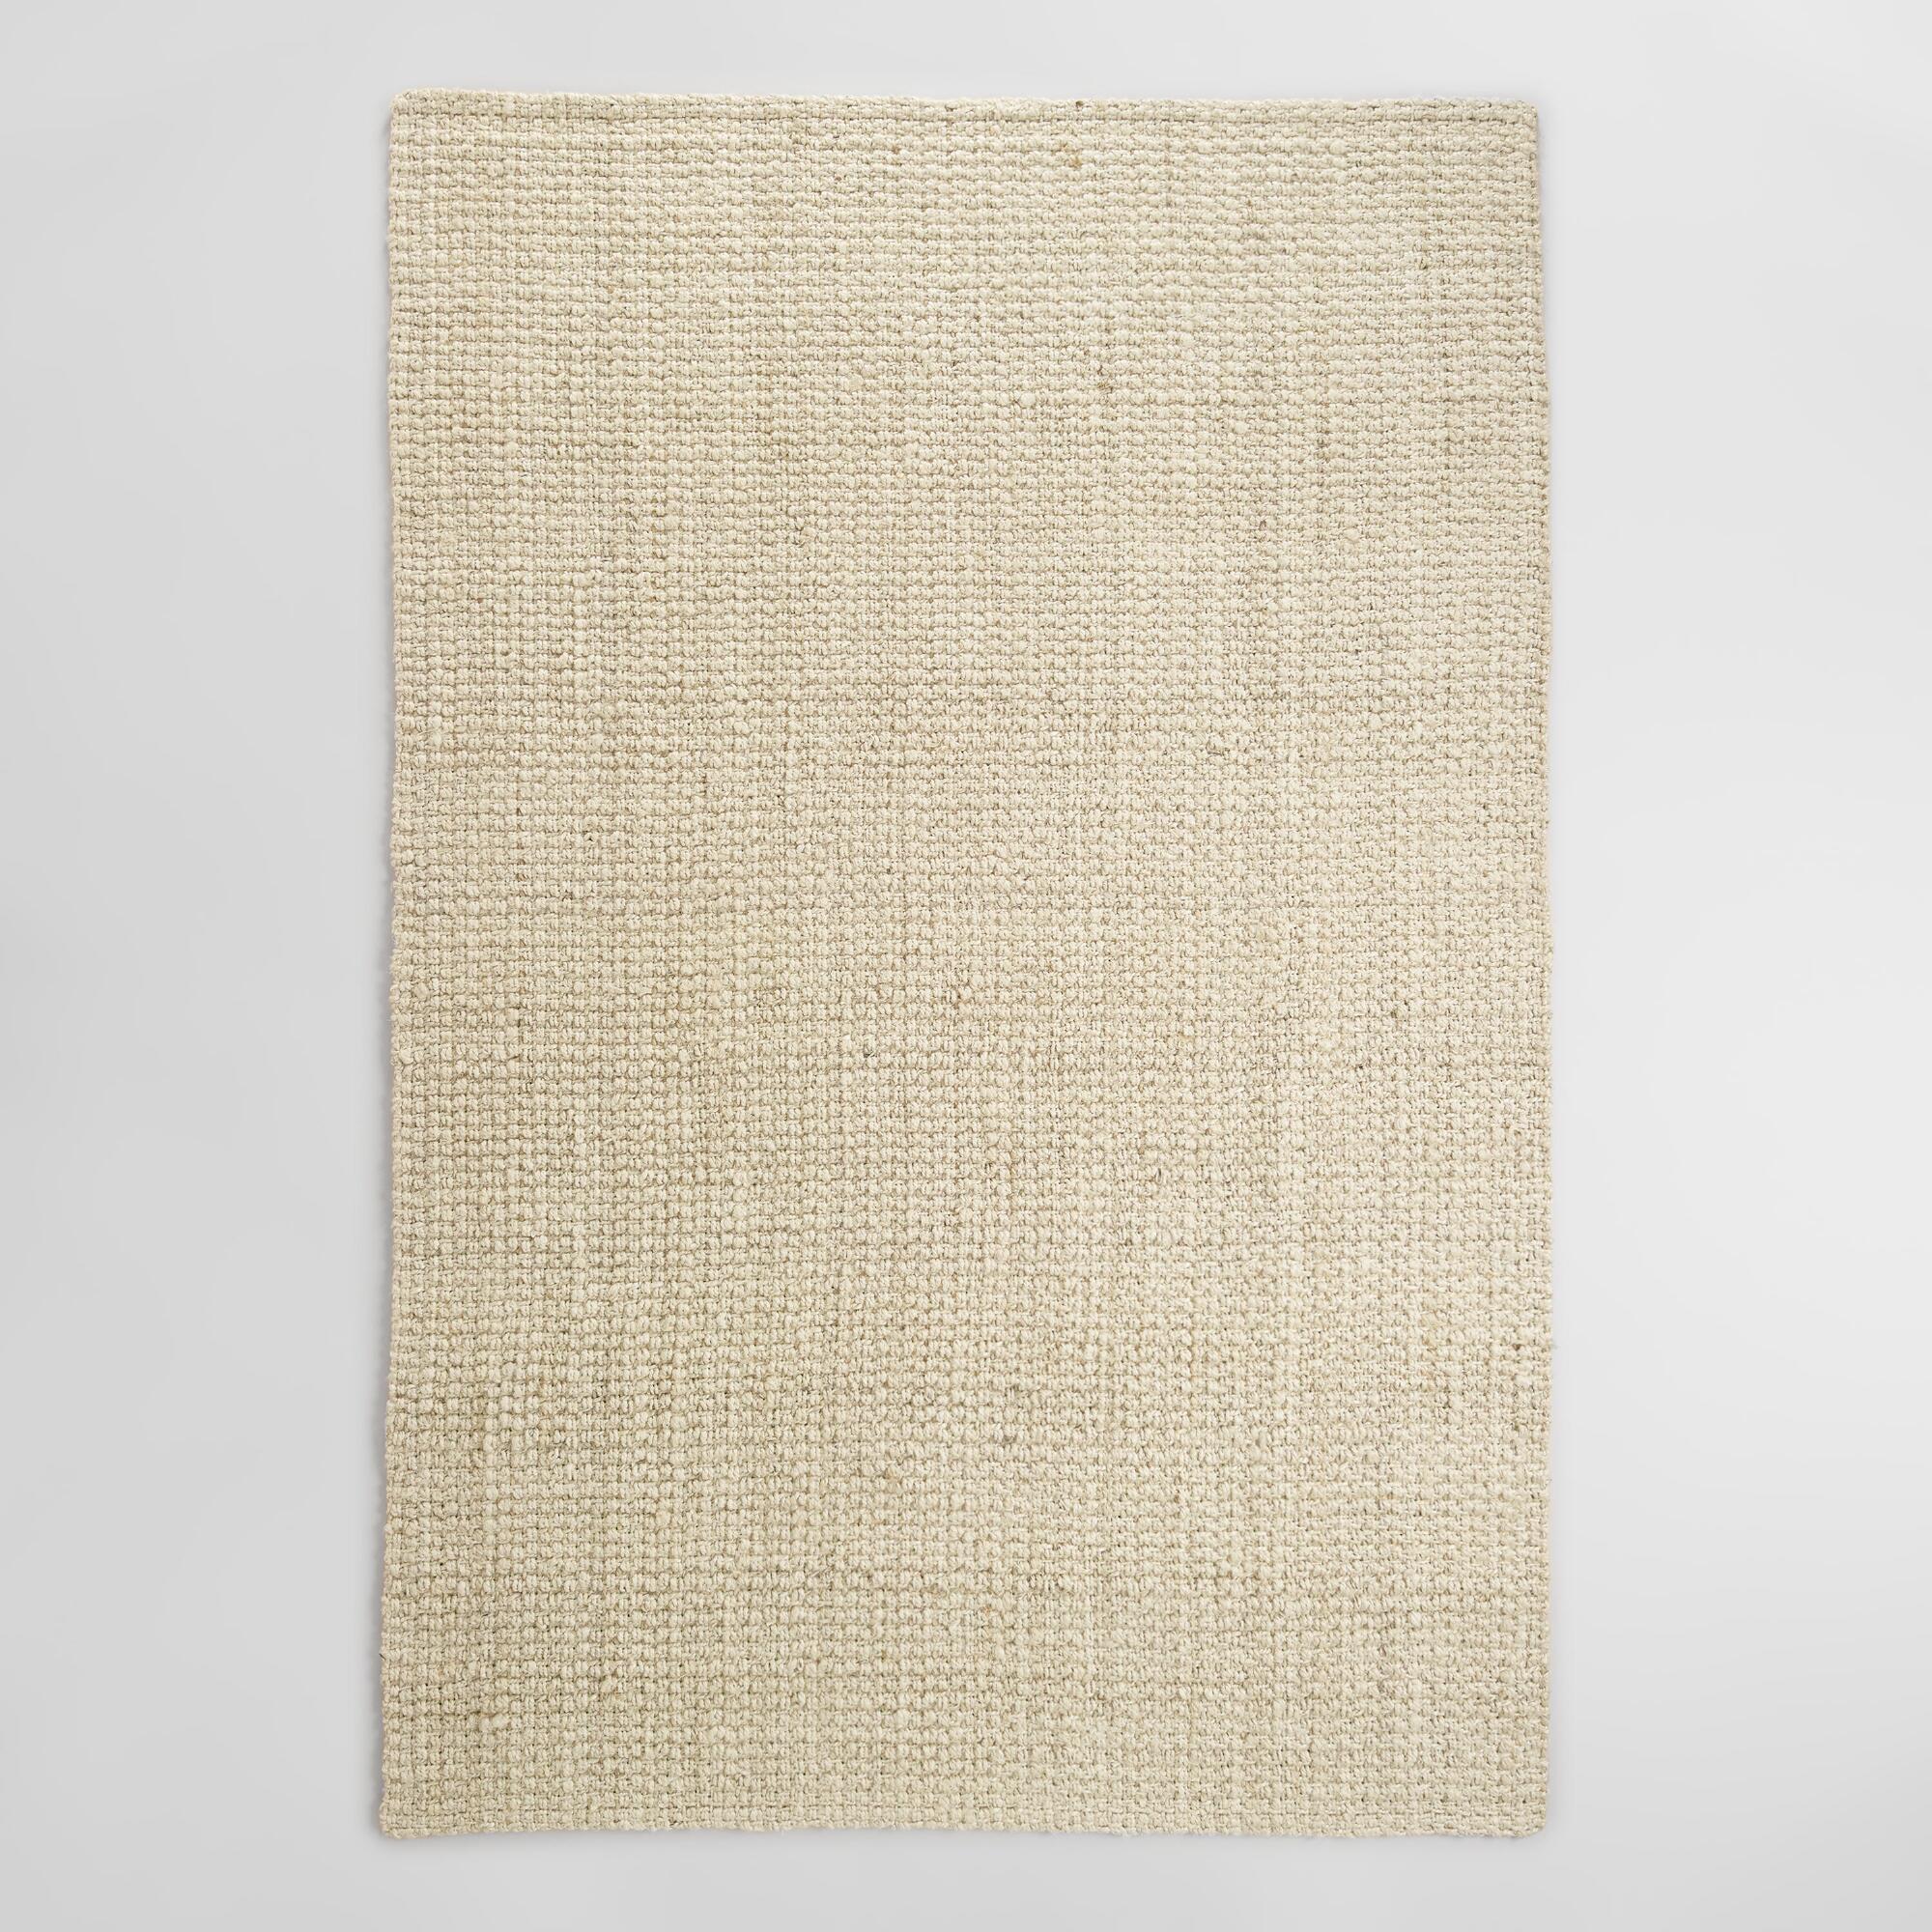 Bleached Ivory Basket Weave Jute Rug With Images Jute Rug